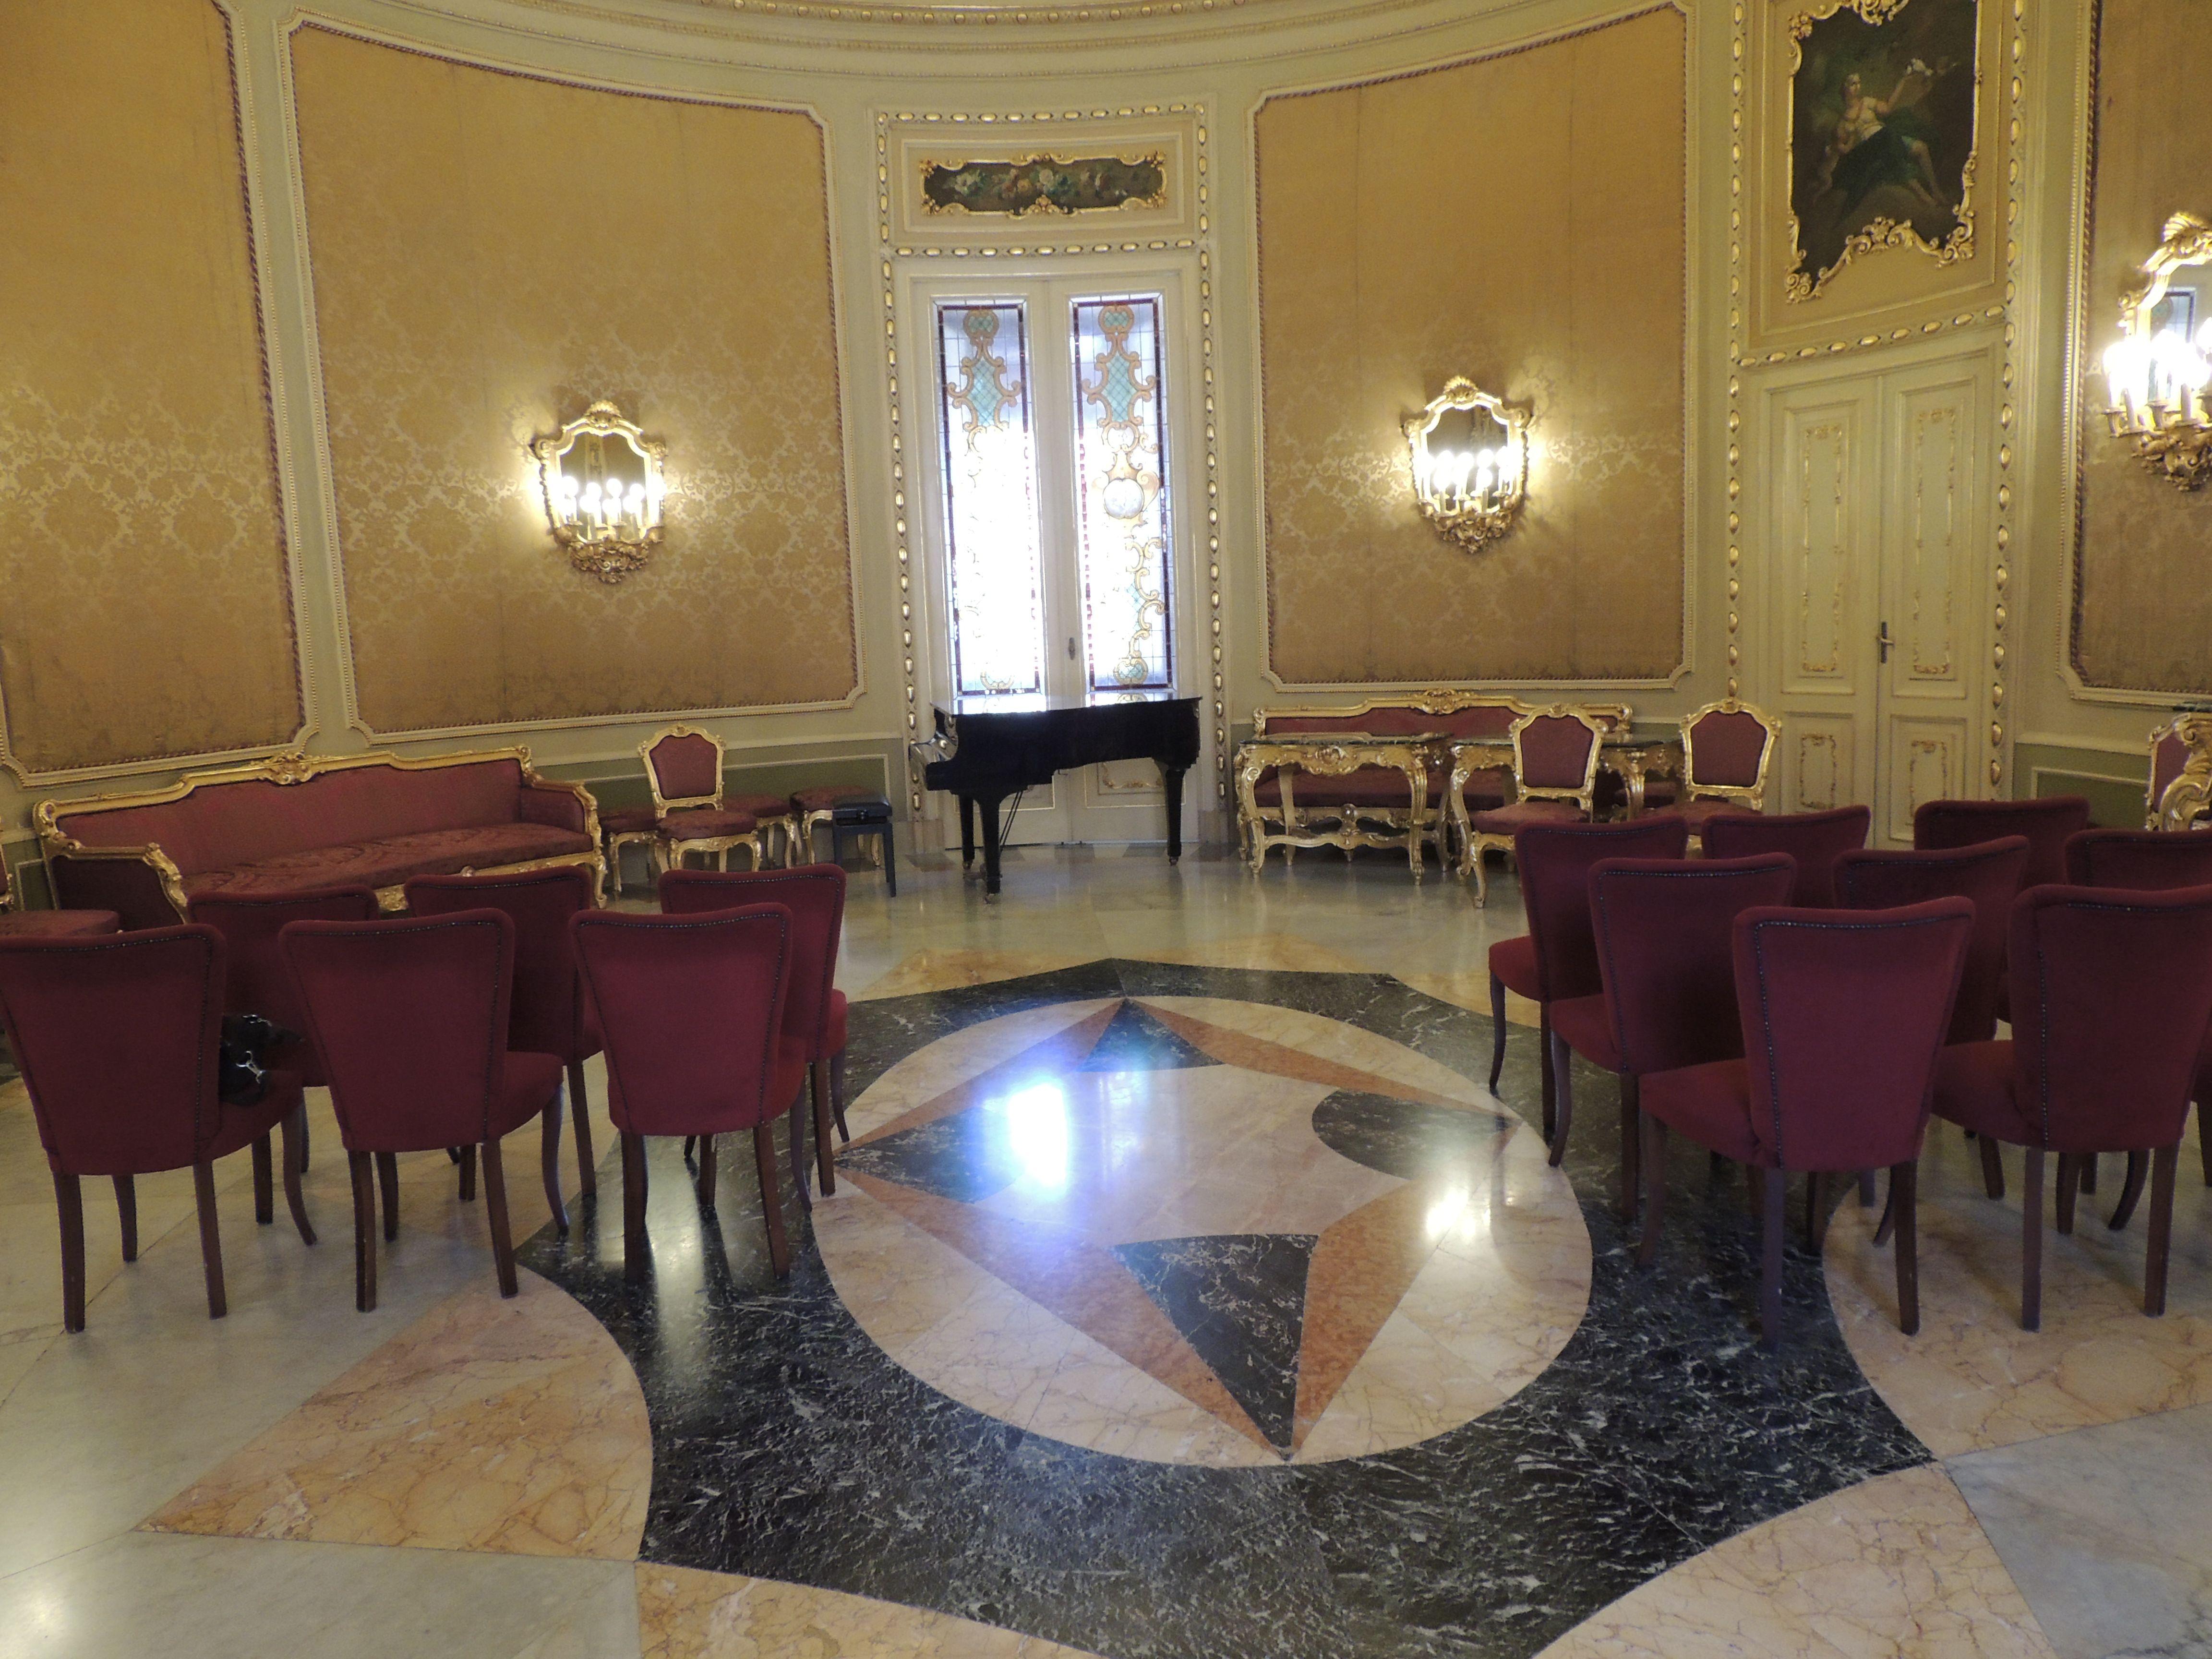 Sala dei matrimoni del Municipio di Noto - SICILIA Italy_Ph Gianluca